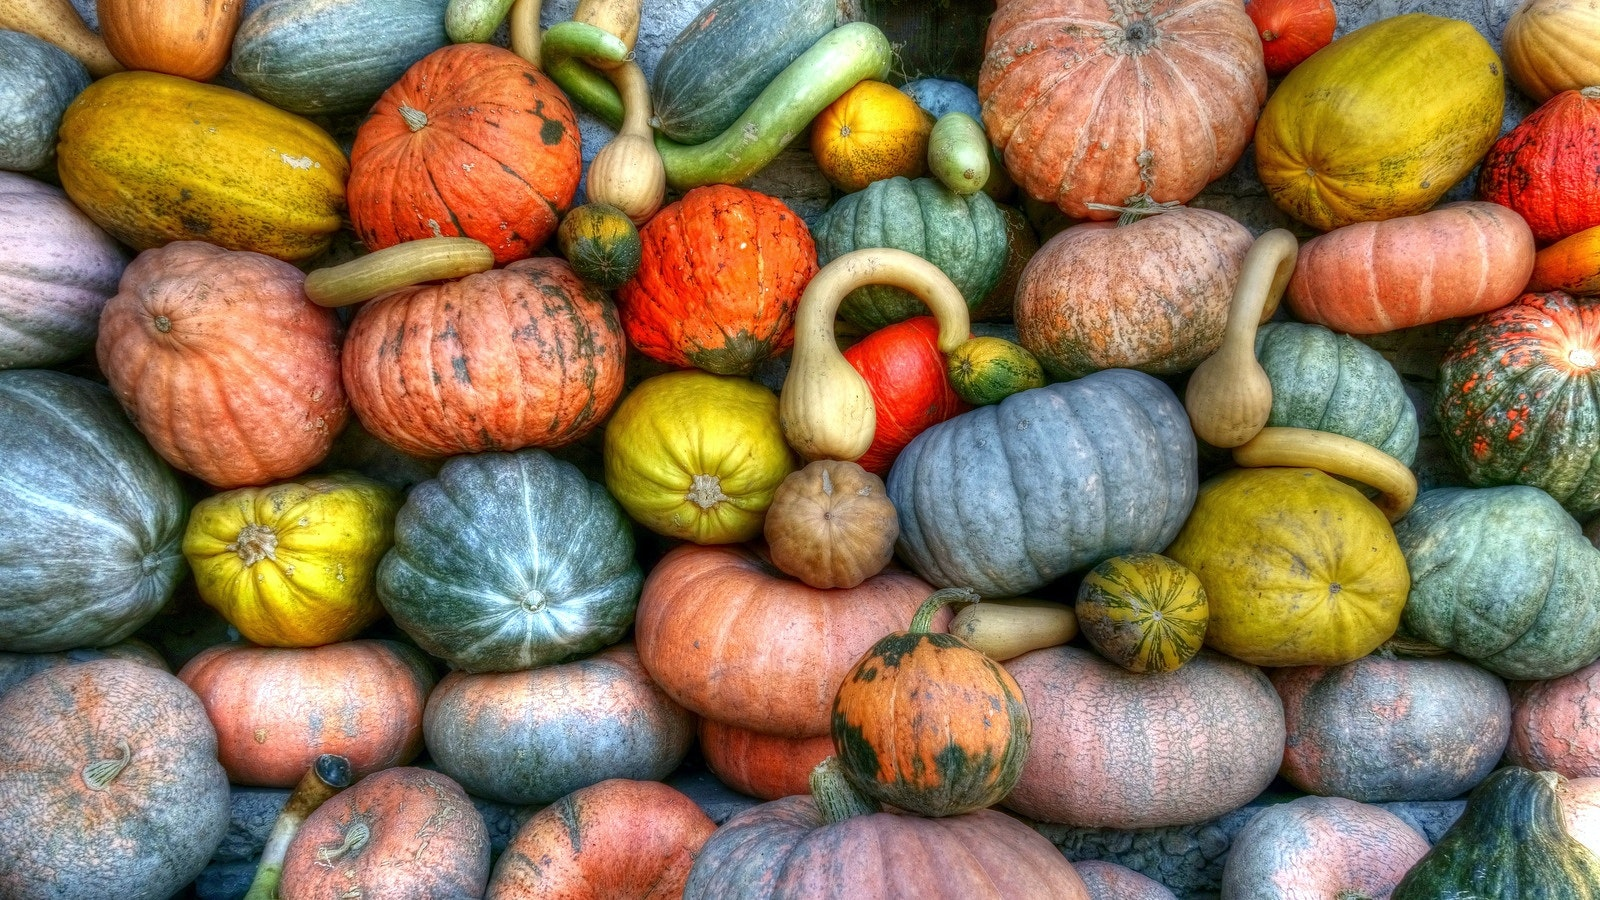 fall pumpkins and squash.jpg